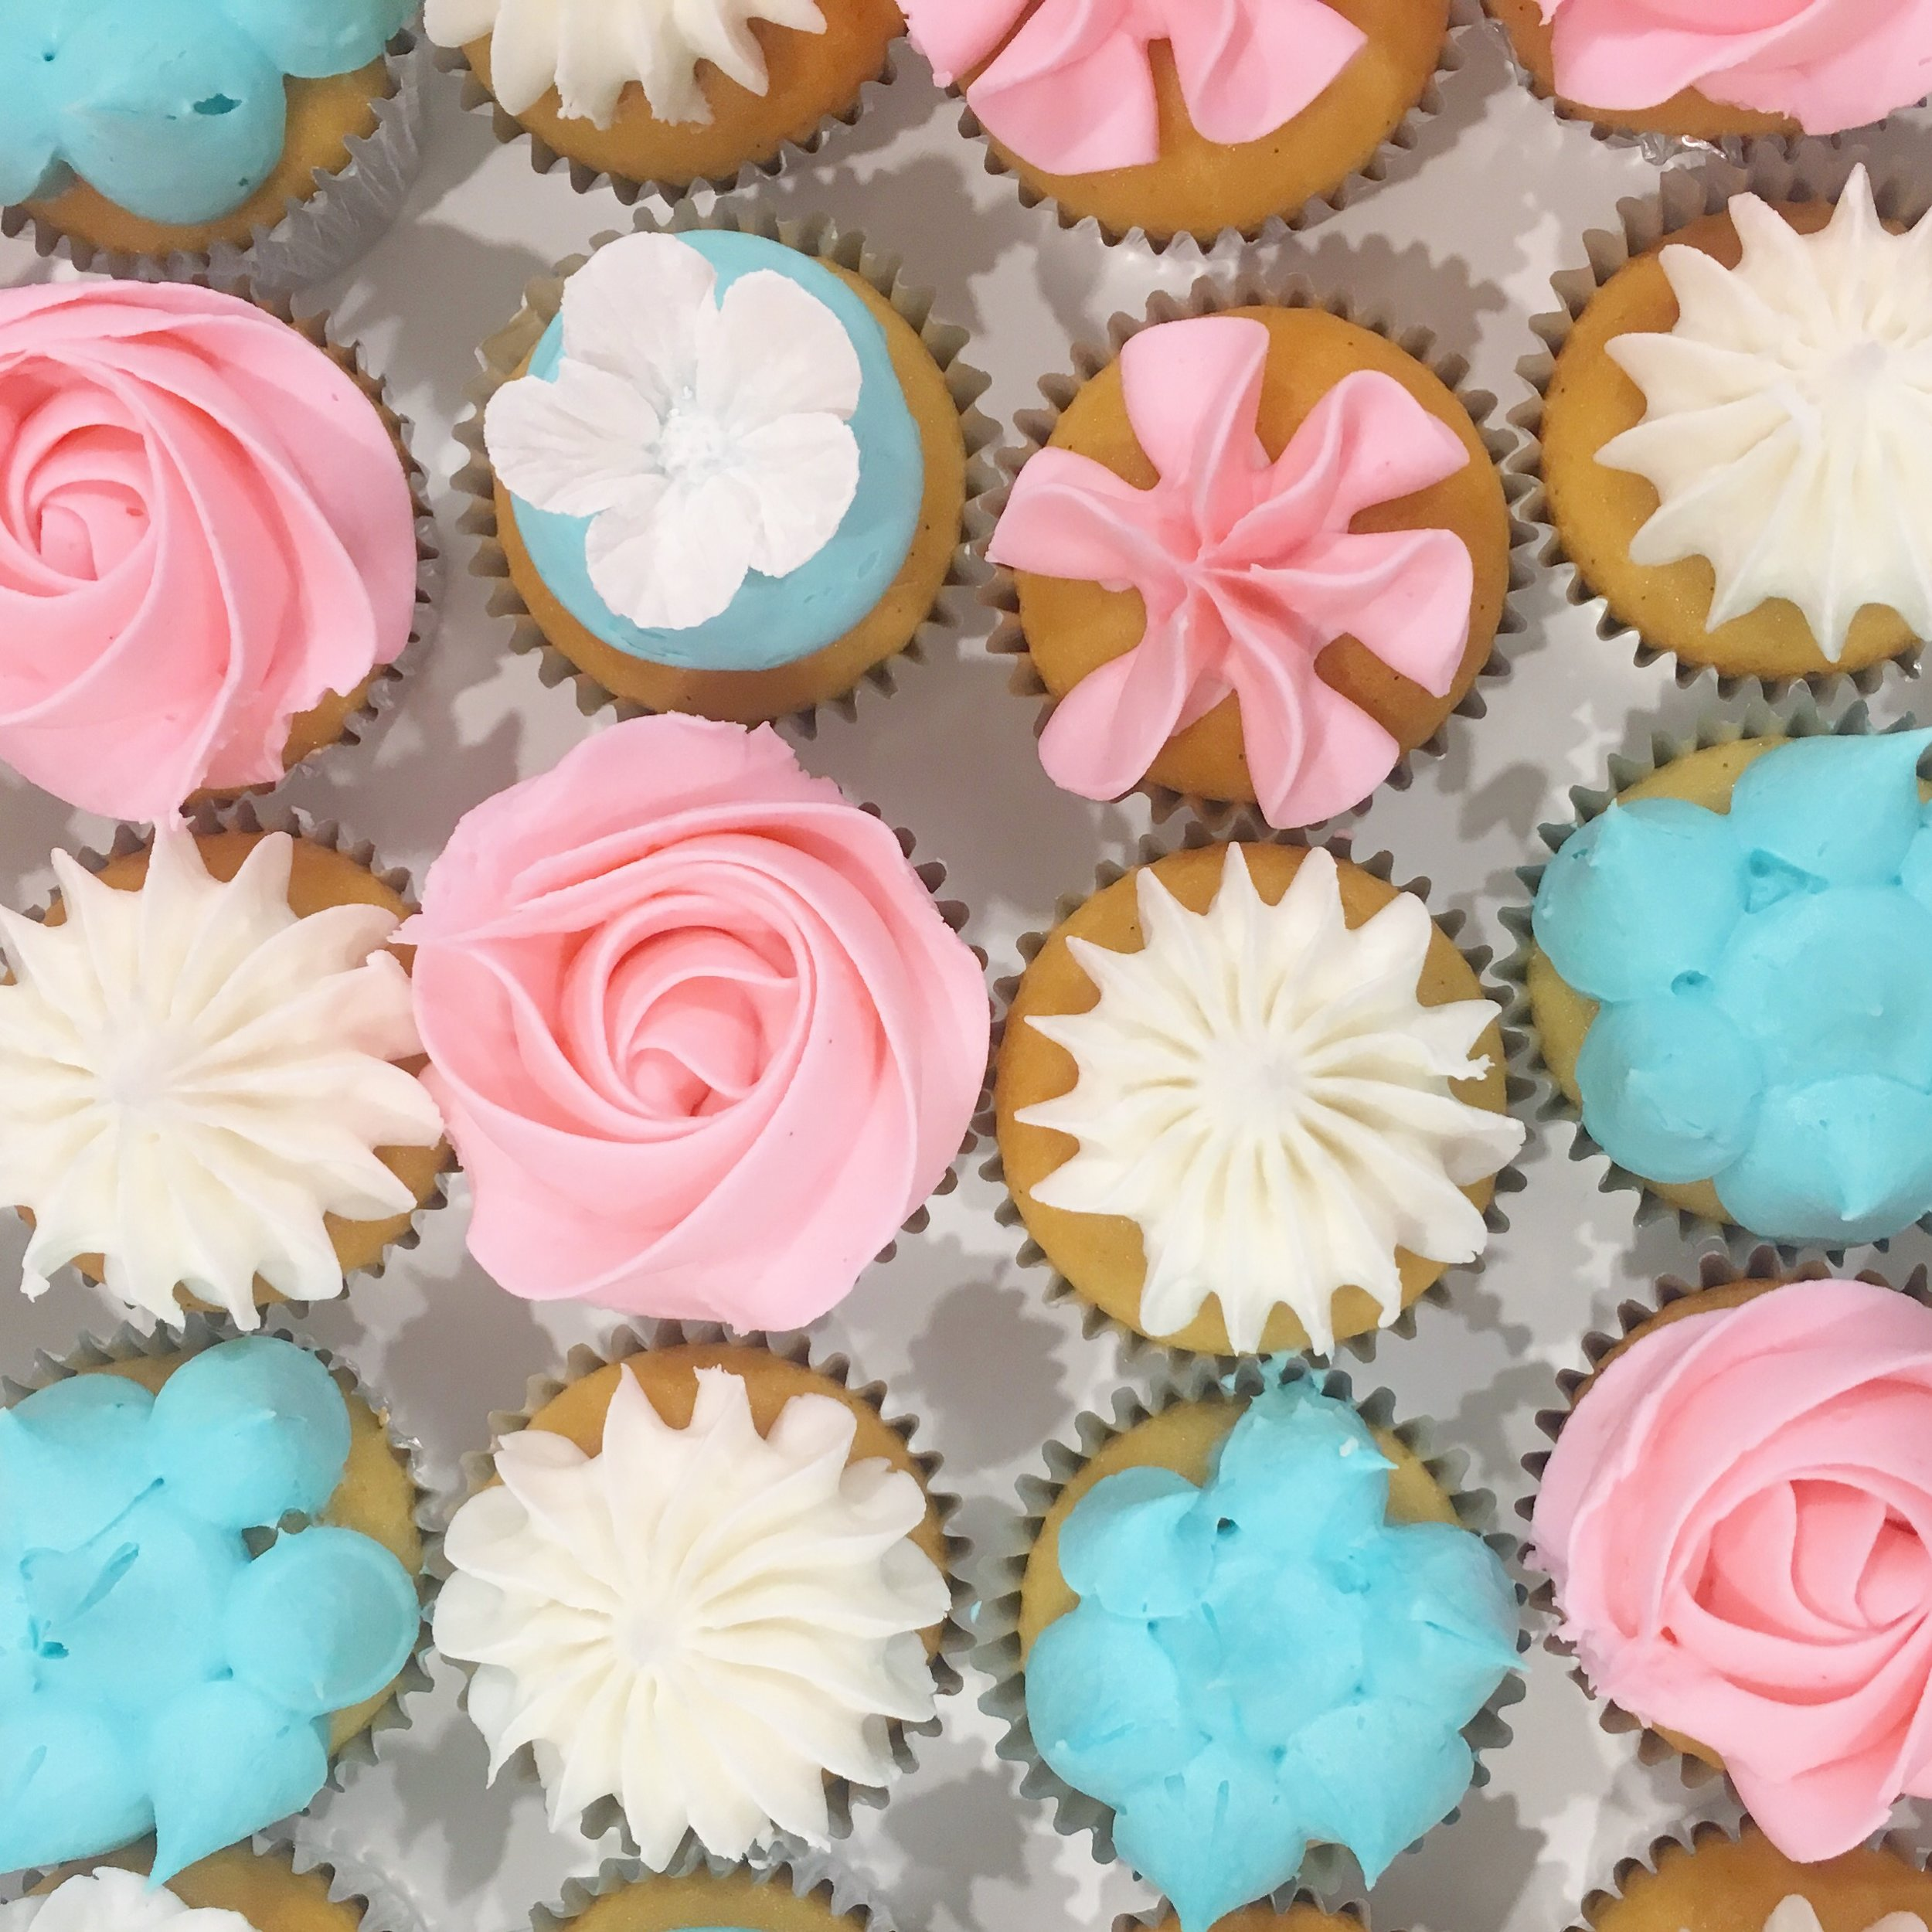 Pink & Blue Flower Cupcakes